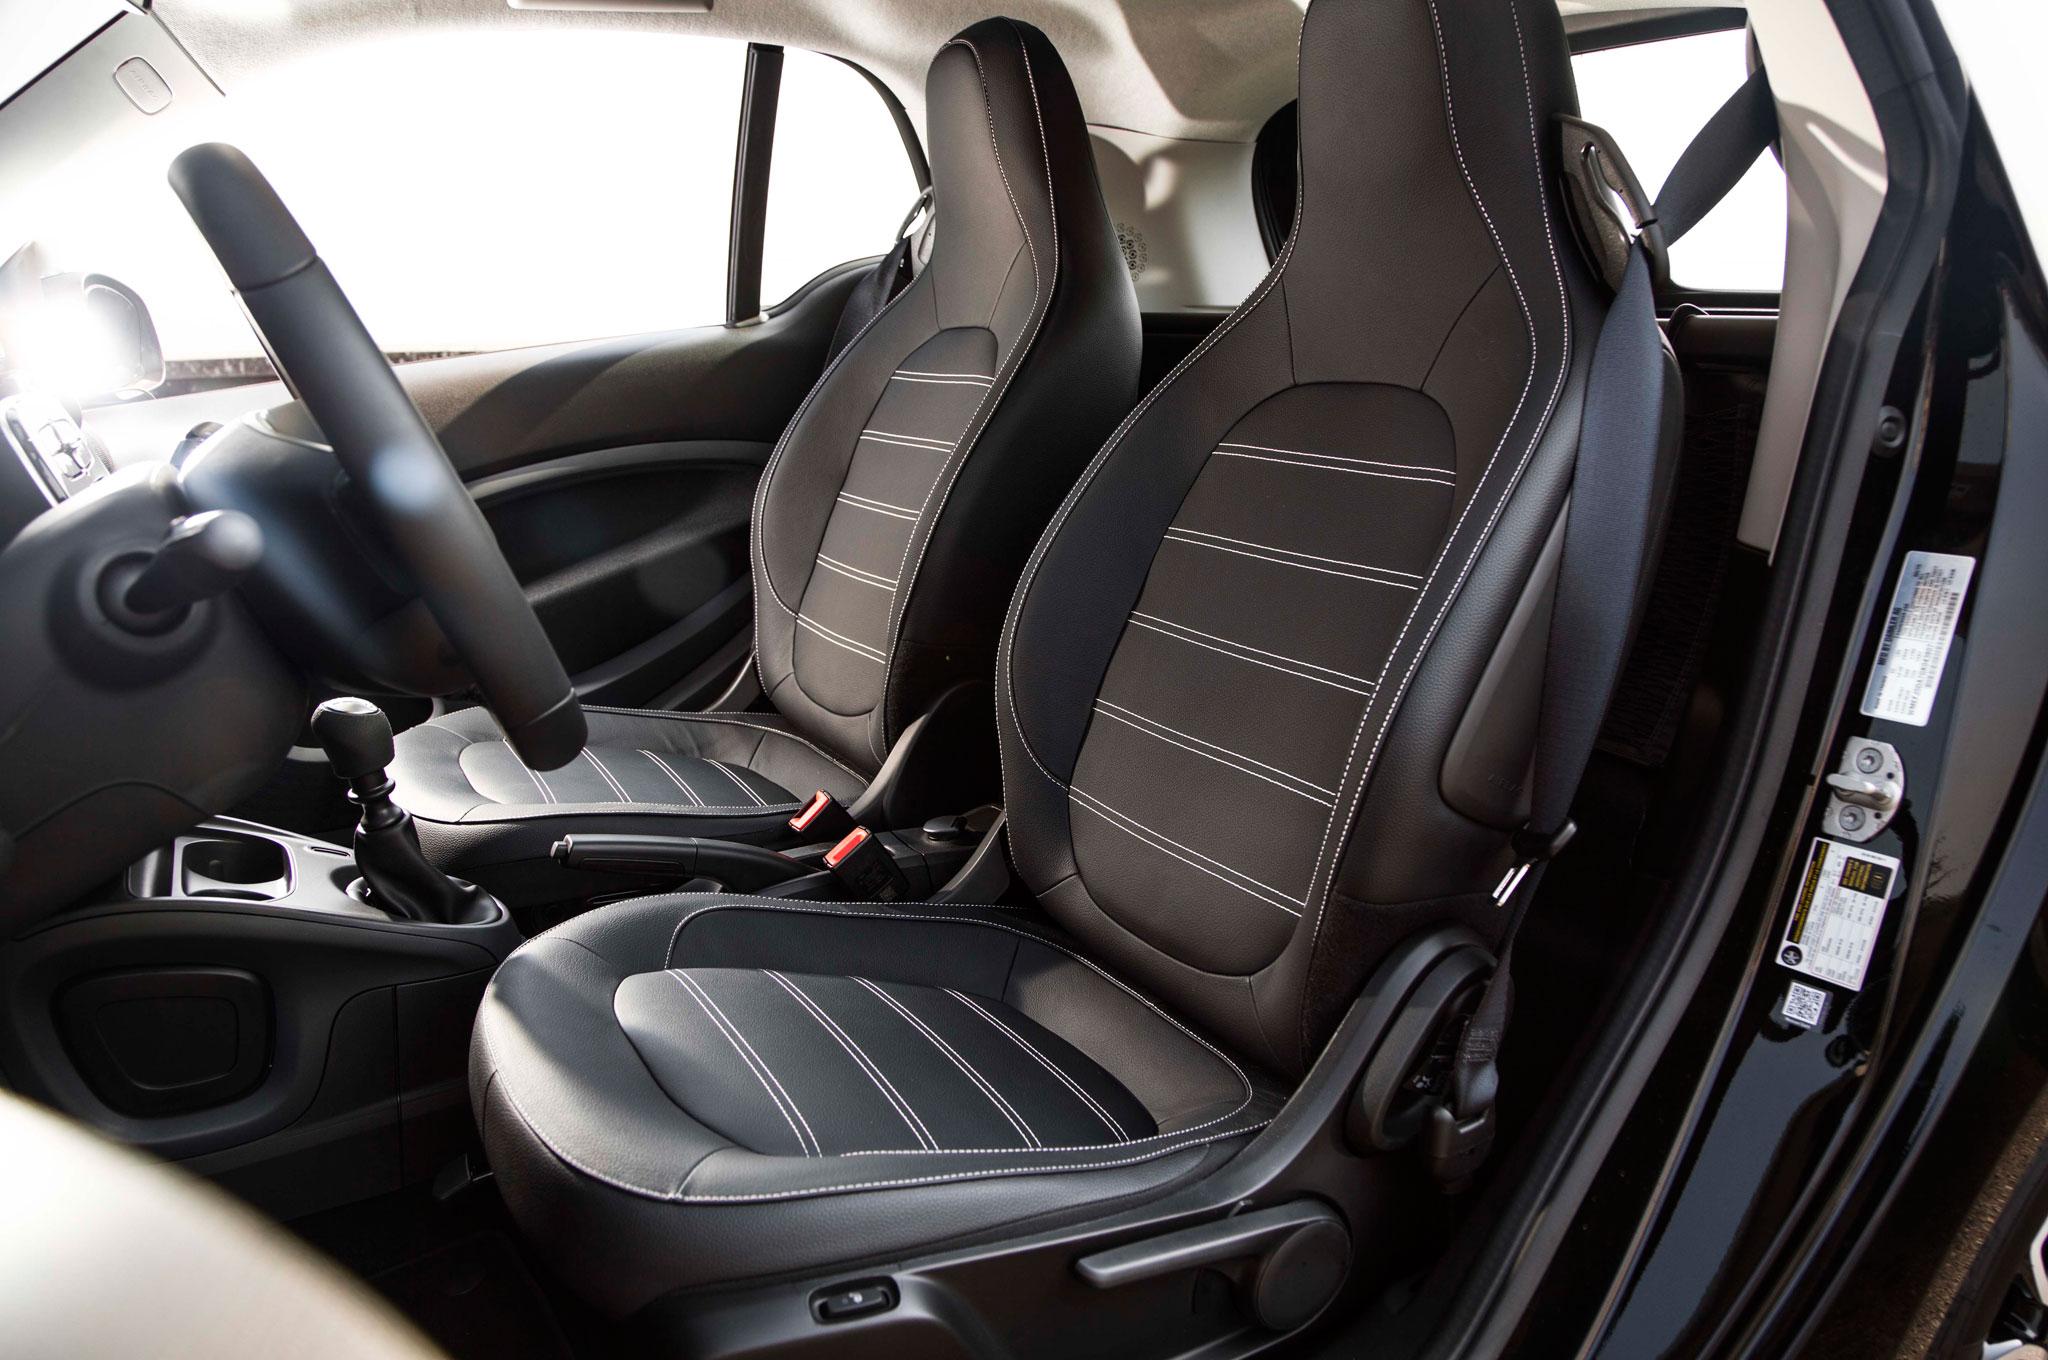 2016 Smart Fortwo Seats Interior